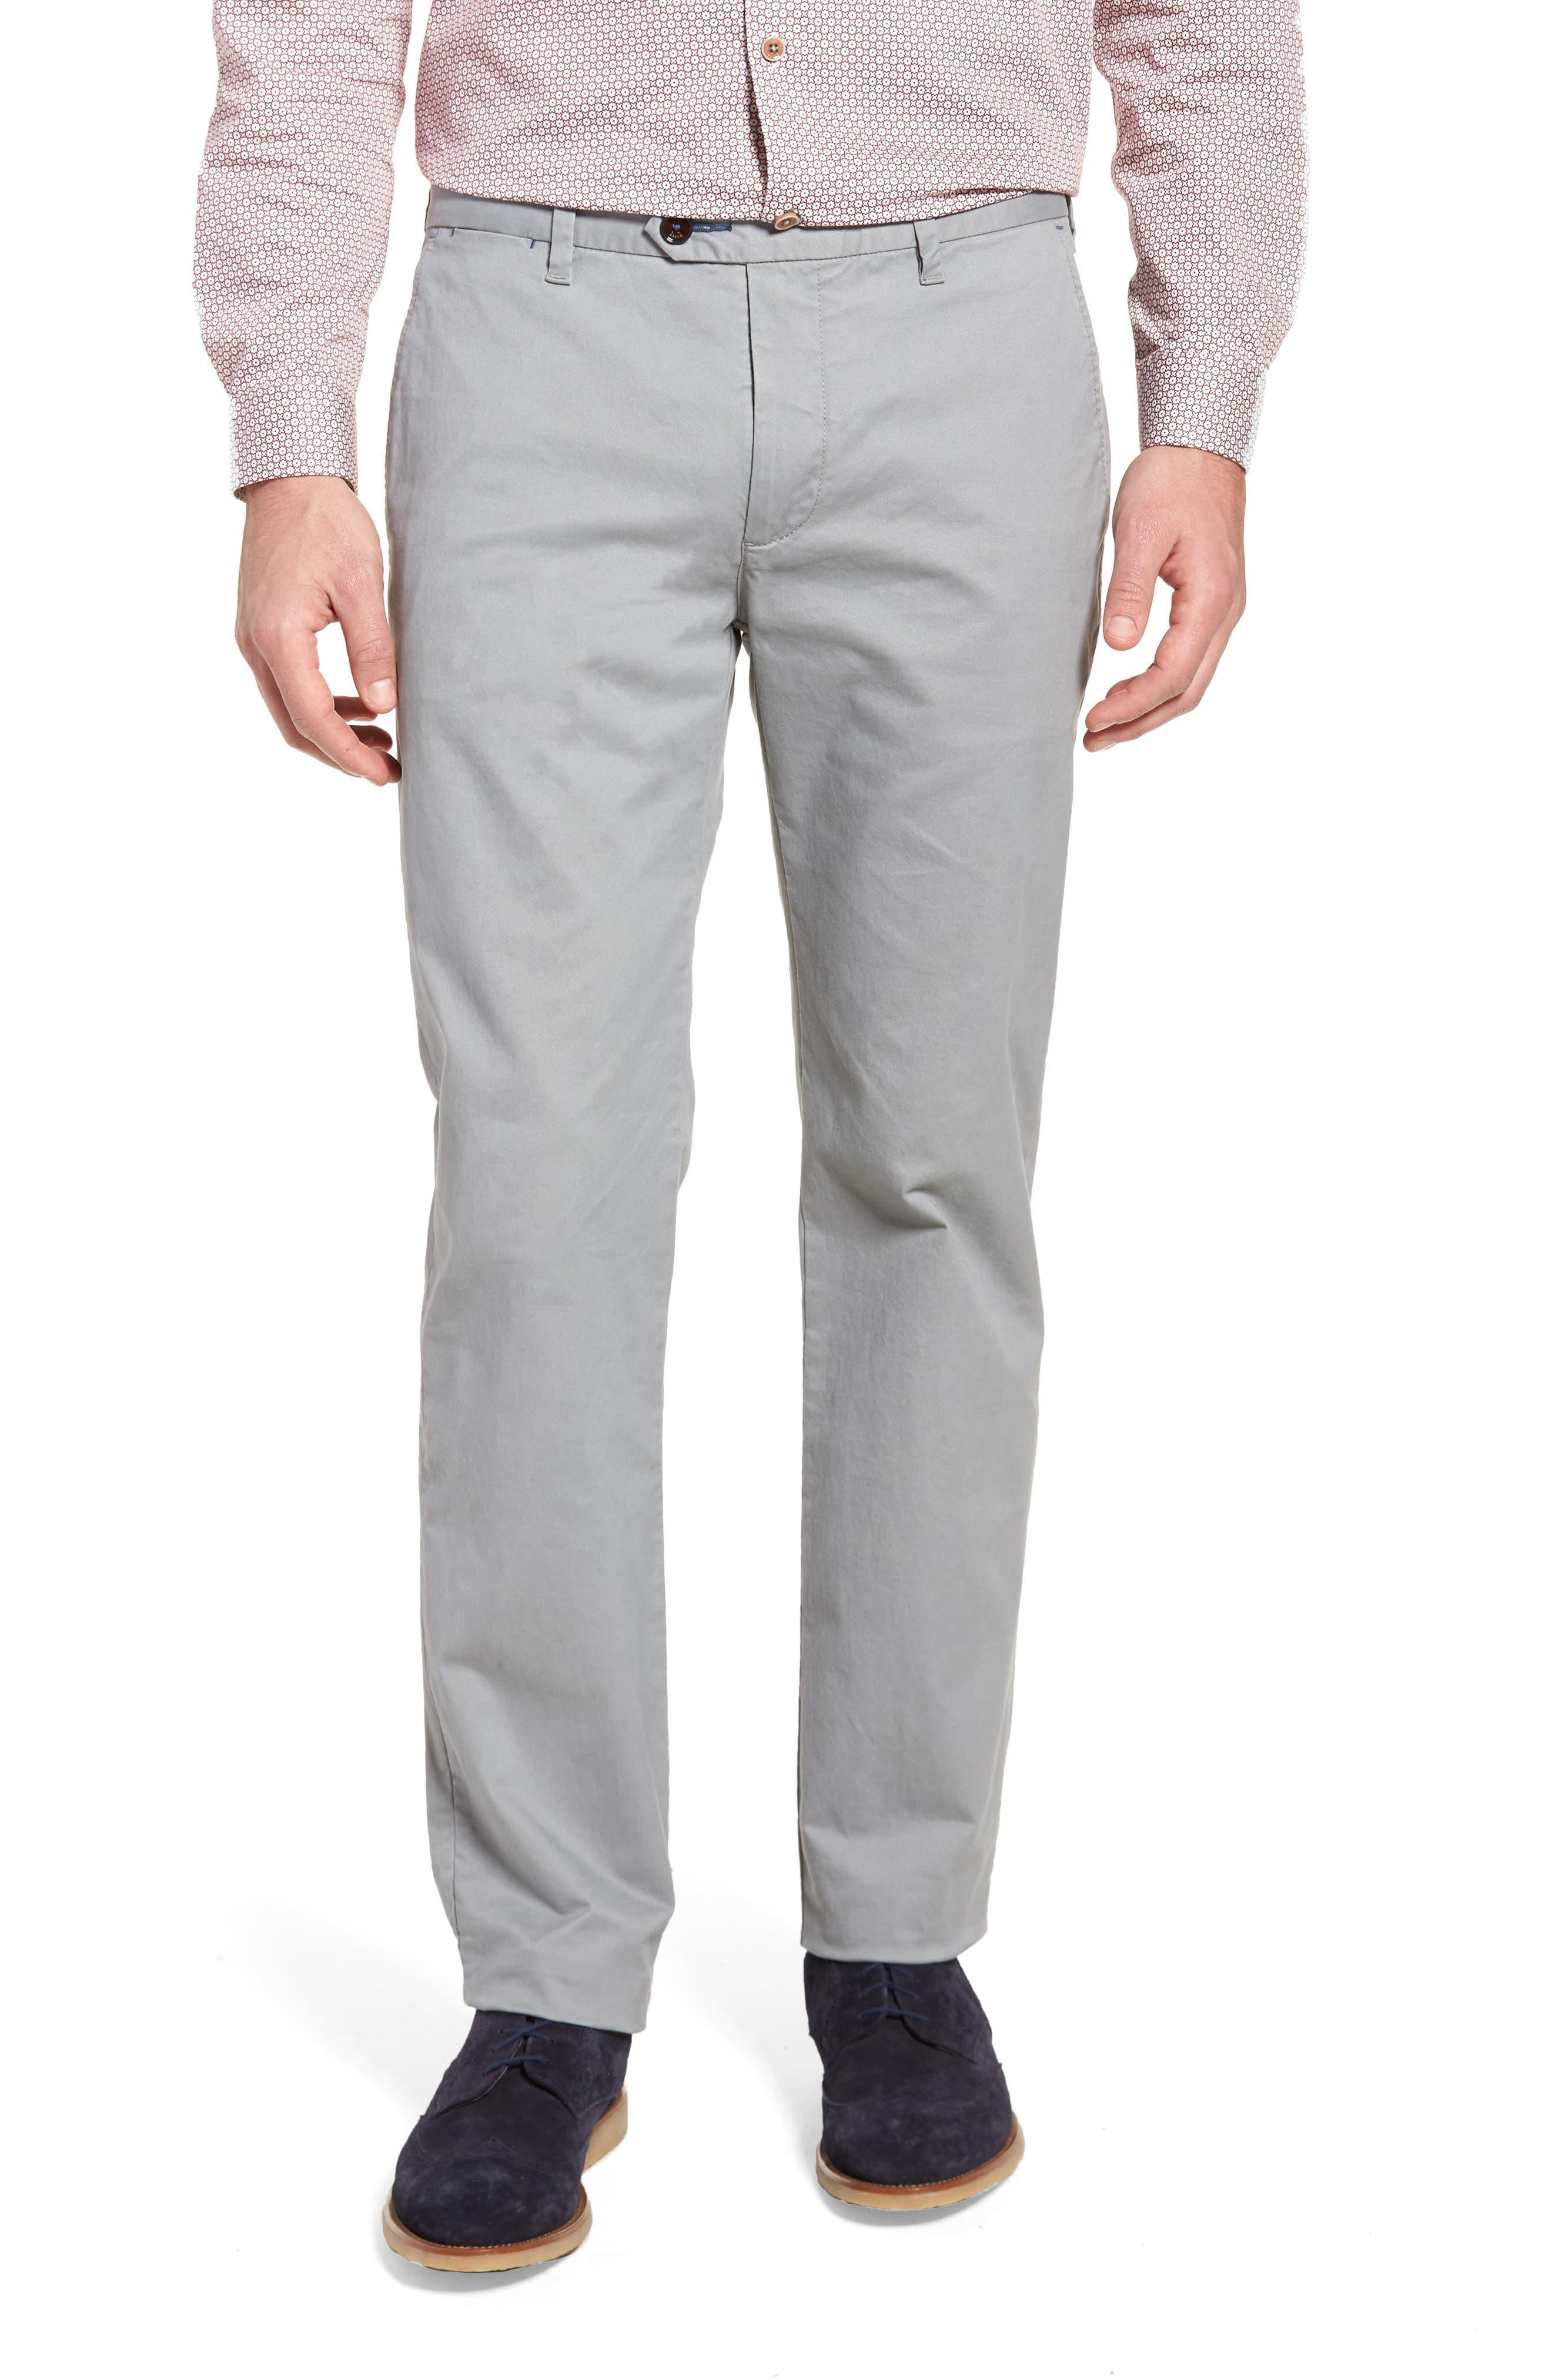 Procor Slim Fit Chino Pants,                         Main,                         color, 050